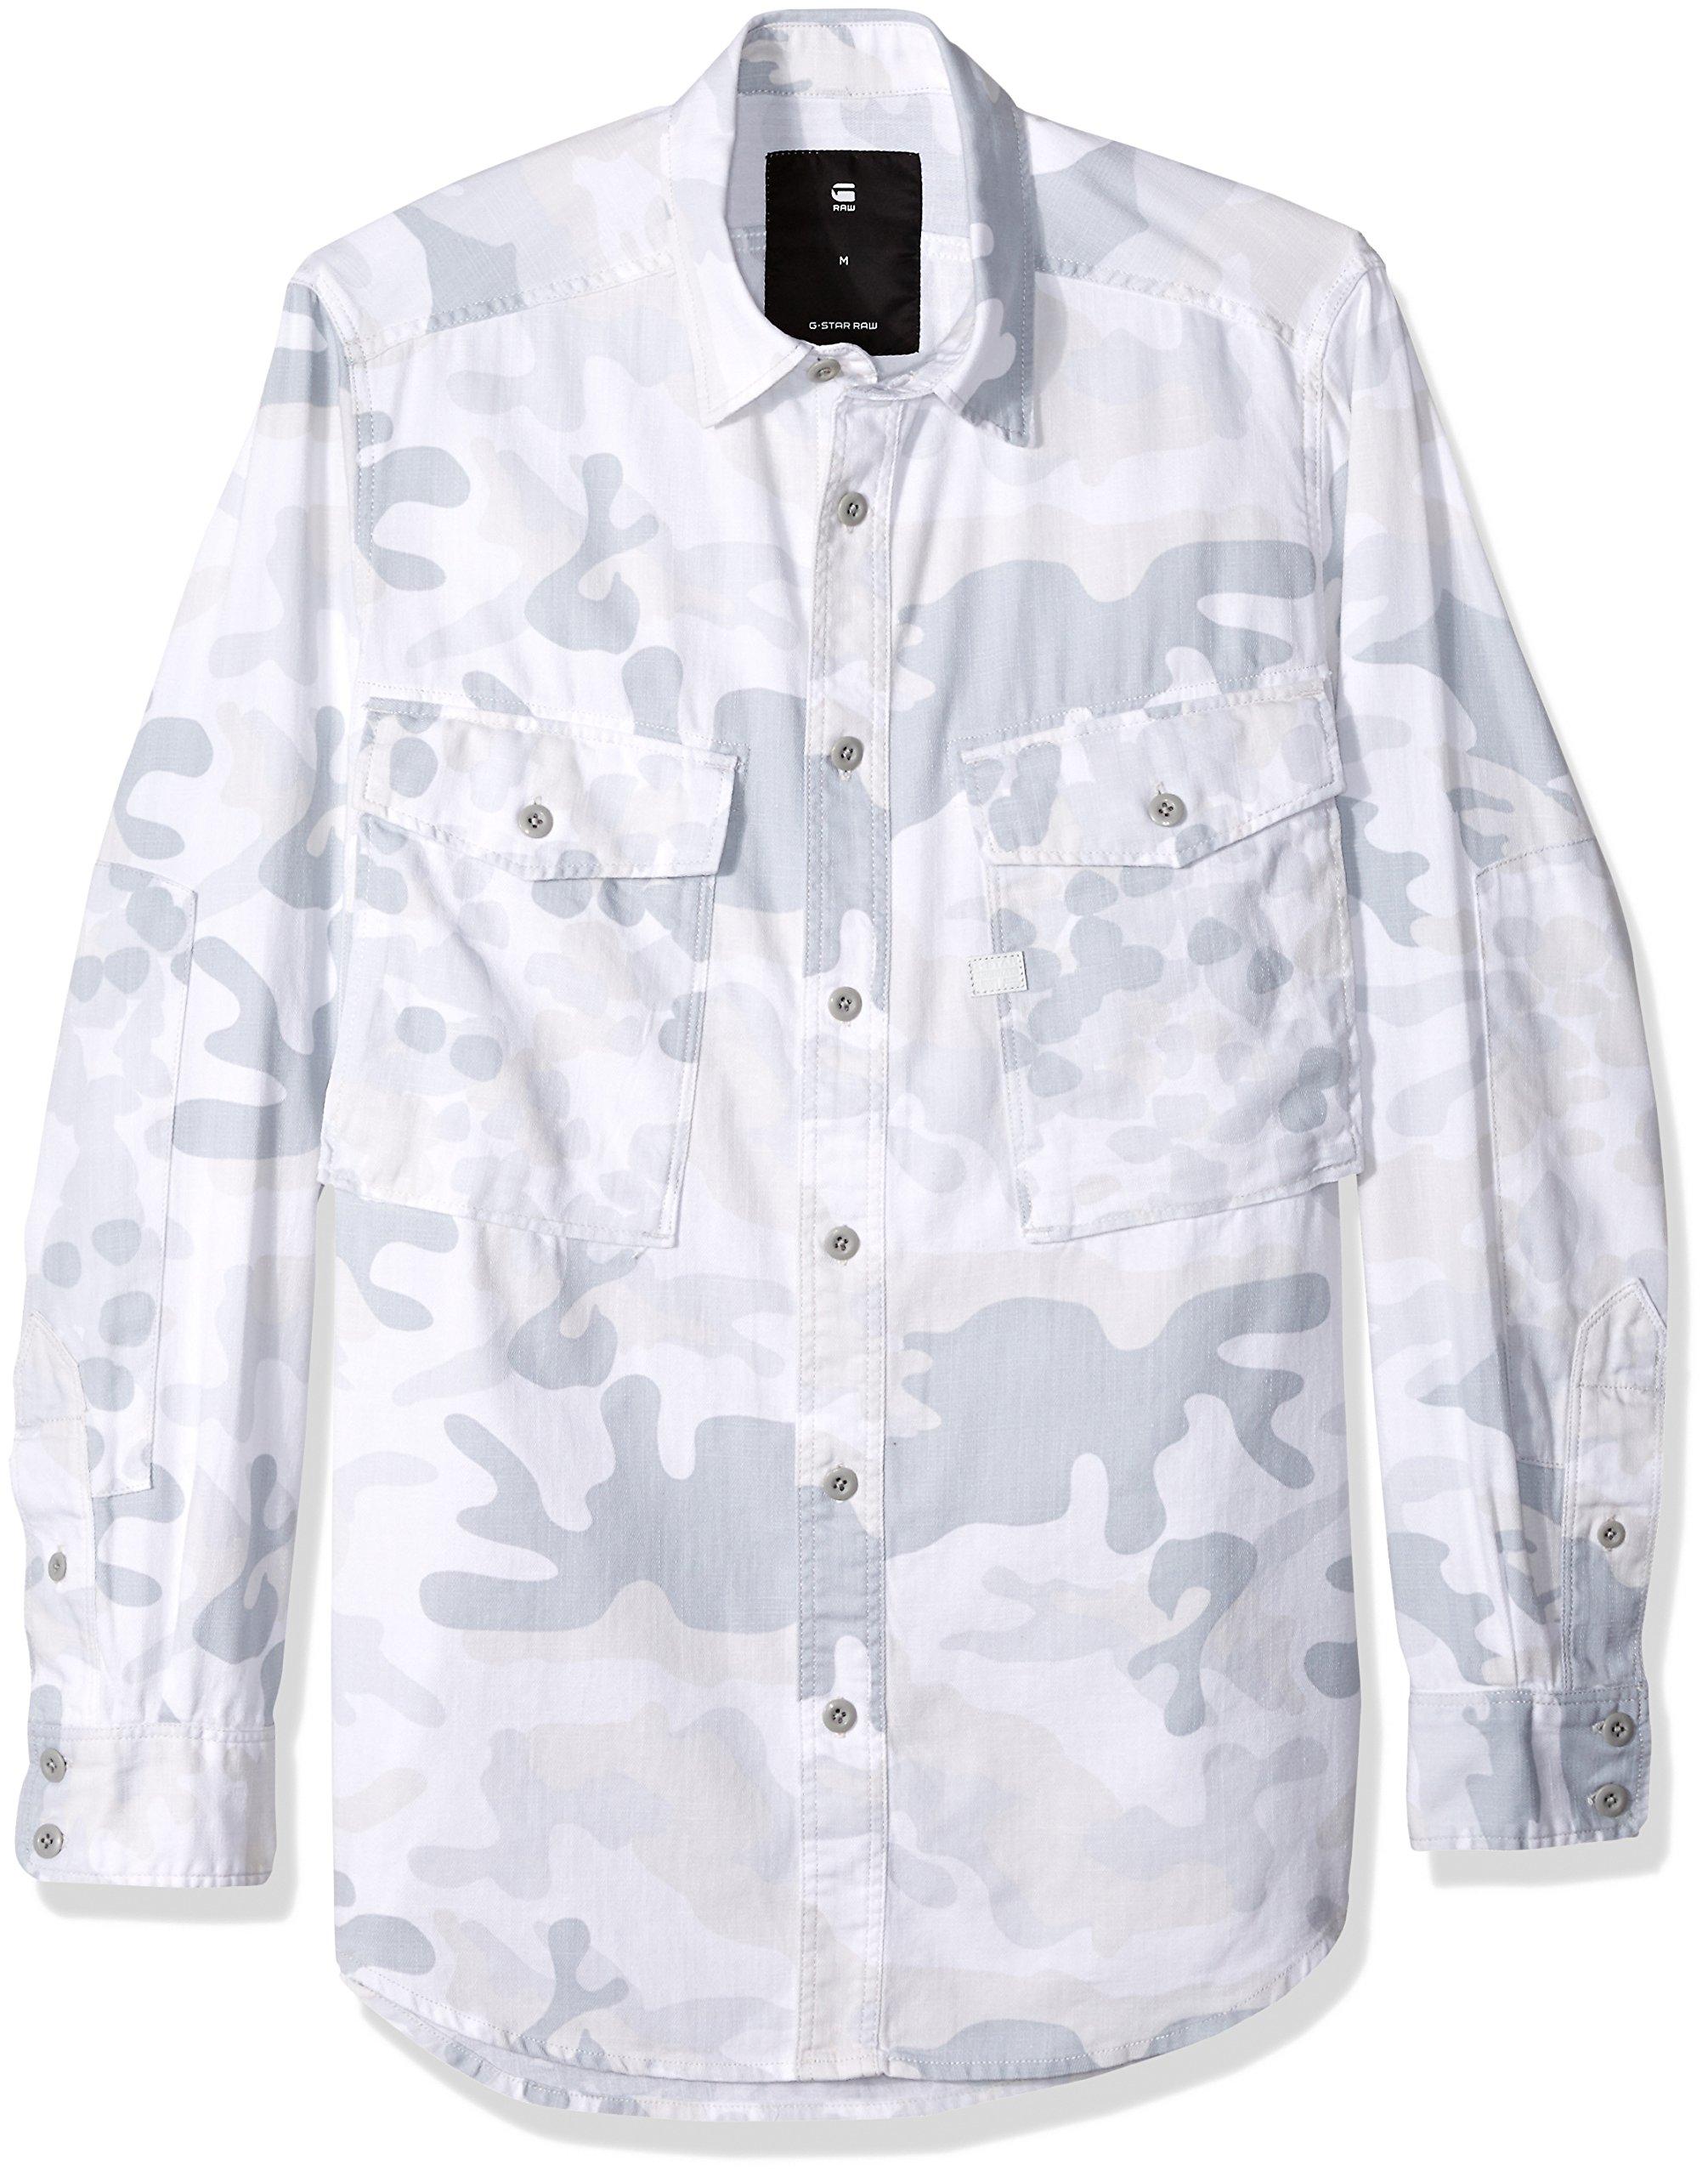 G-Star Raw Men's Type C Straight Long RC Shirt L/s, Milk/Industrial Grey, Large